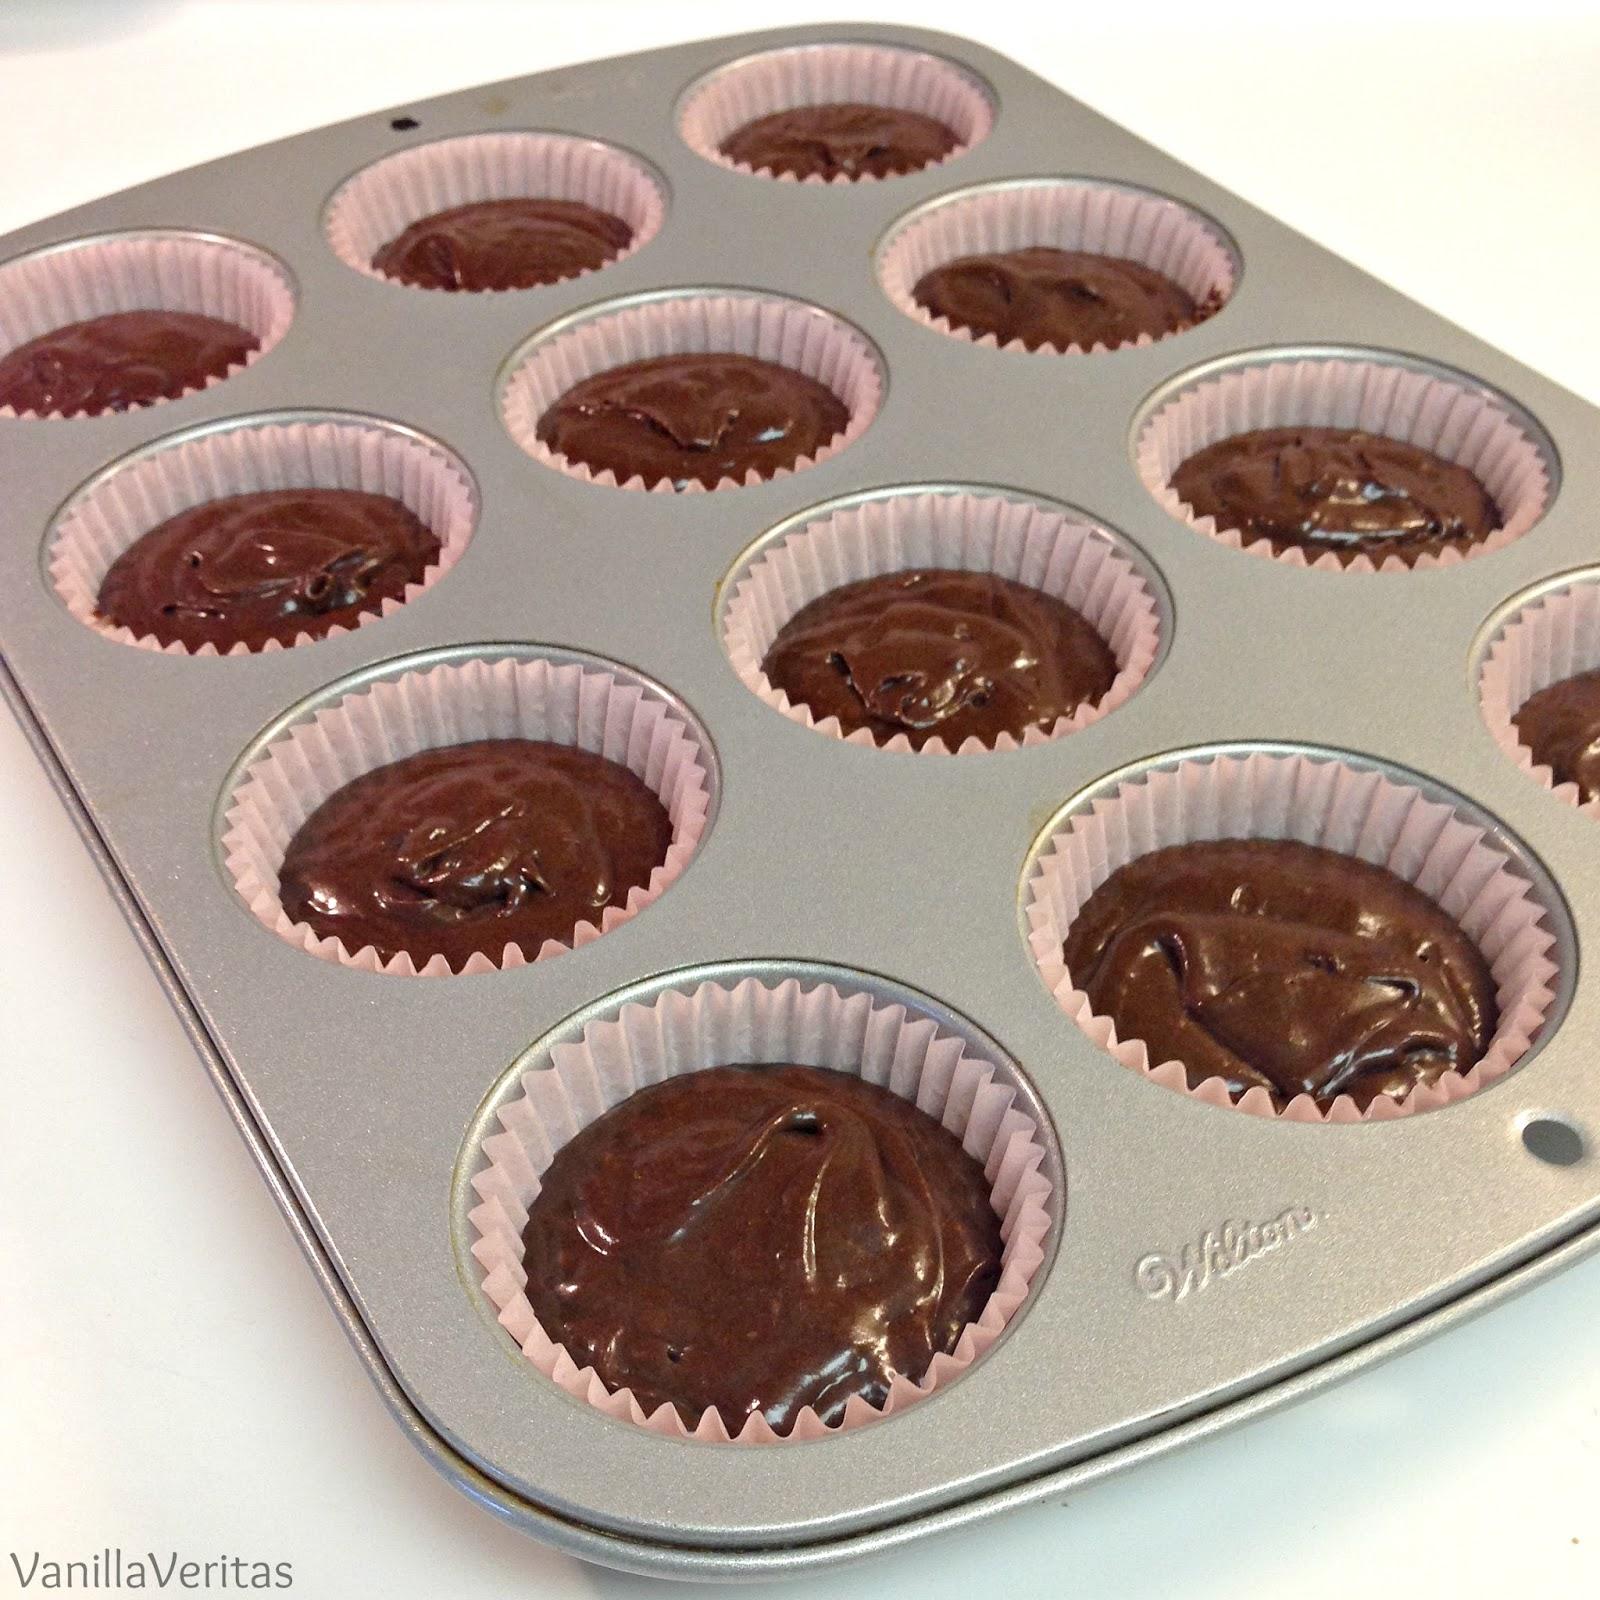 chocolate | cupcakes | triple chocolate cupcakes | double chocolate | dutch chocolate | chocolate cupcake | death by chocolate | chocolate filling | ganache | buttercream | icing | frosting | cake | dessert | dark chocolate